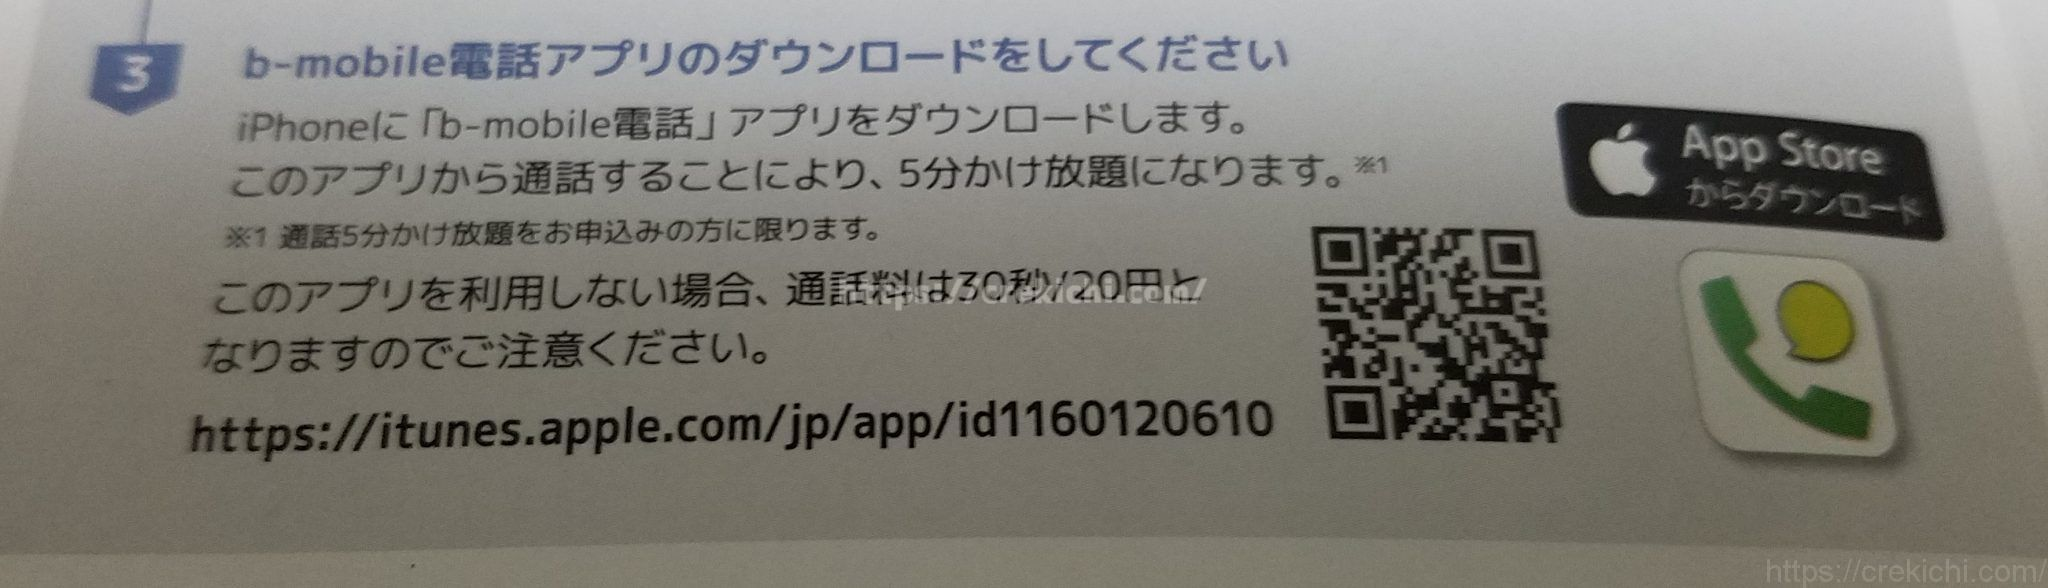 b-mobile 電話アプリ